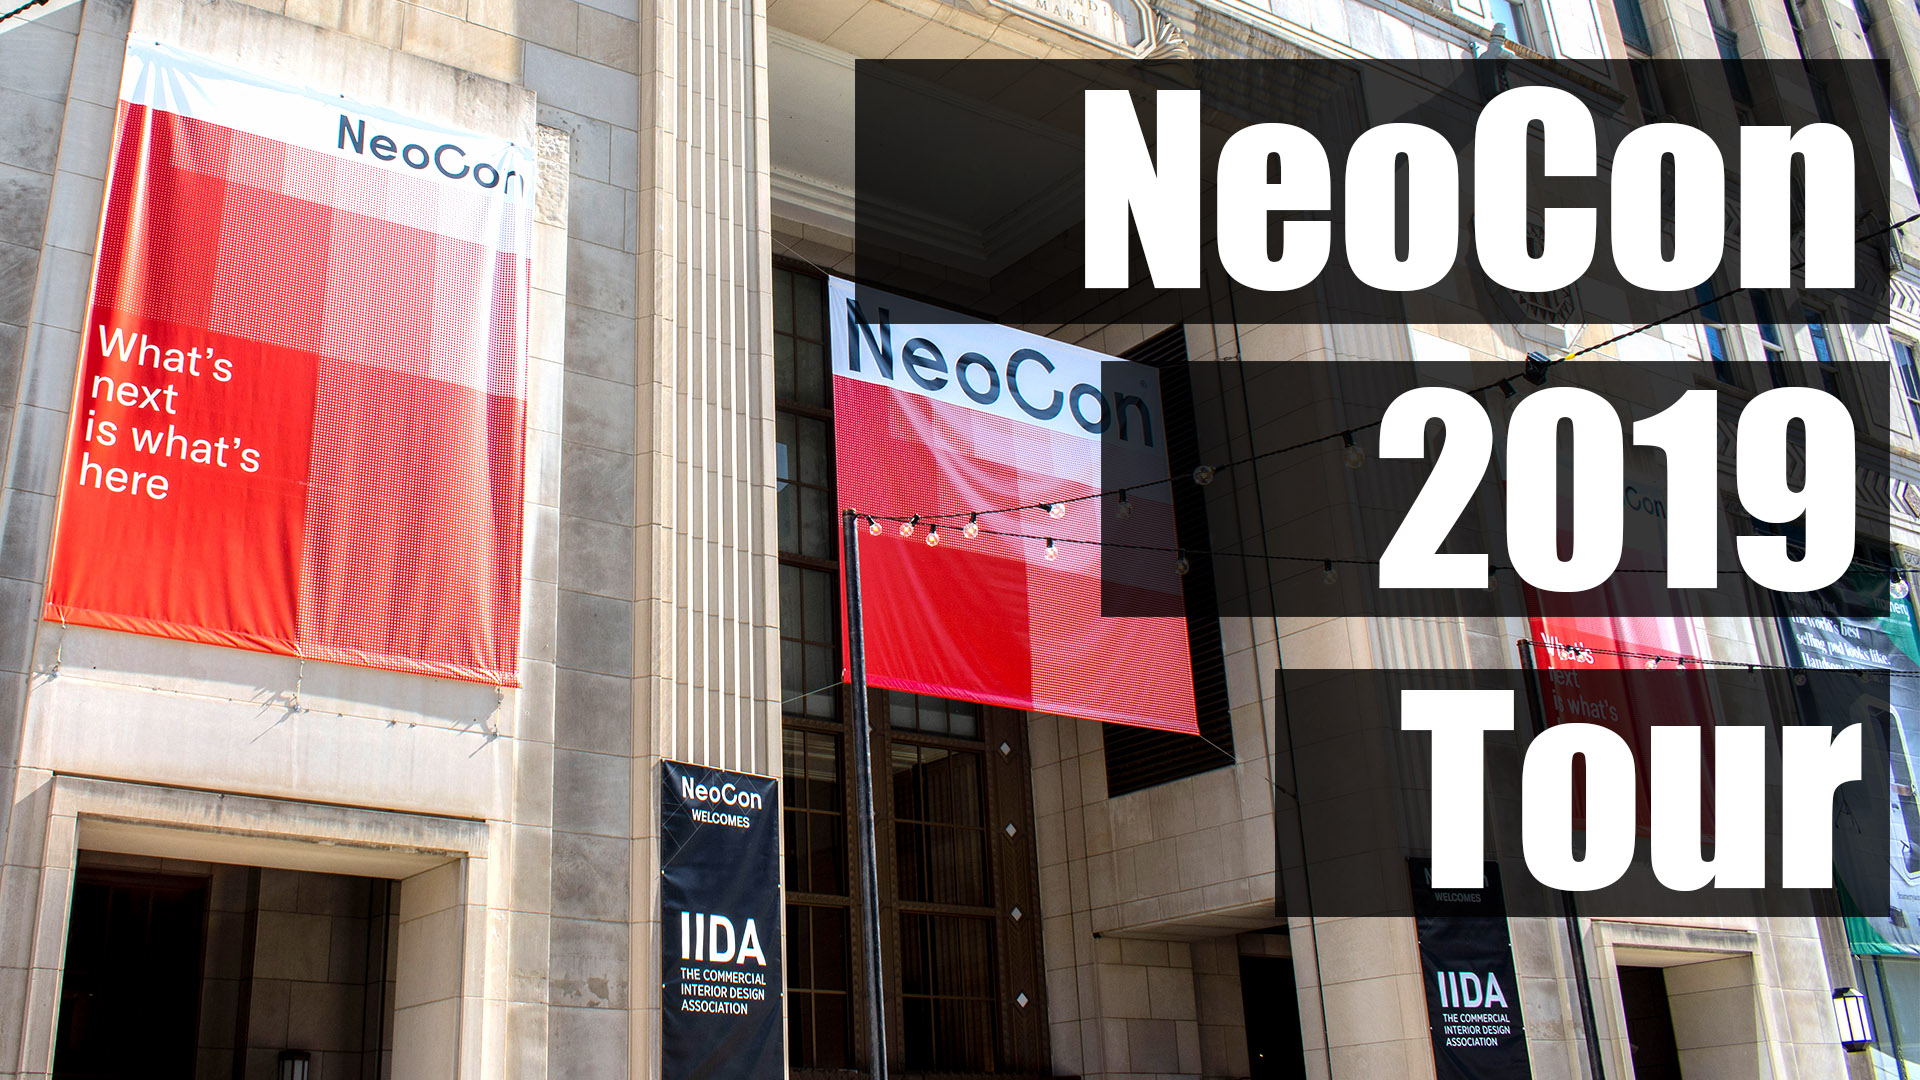 neocon thumbnail 19